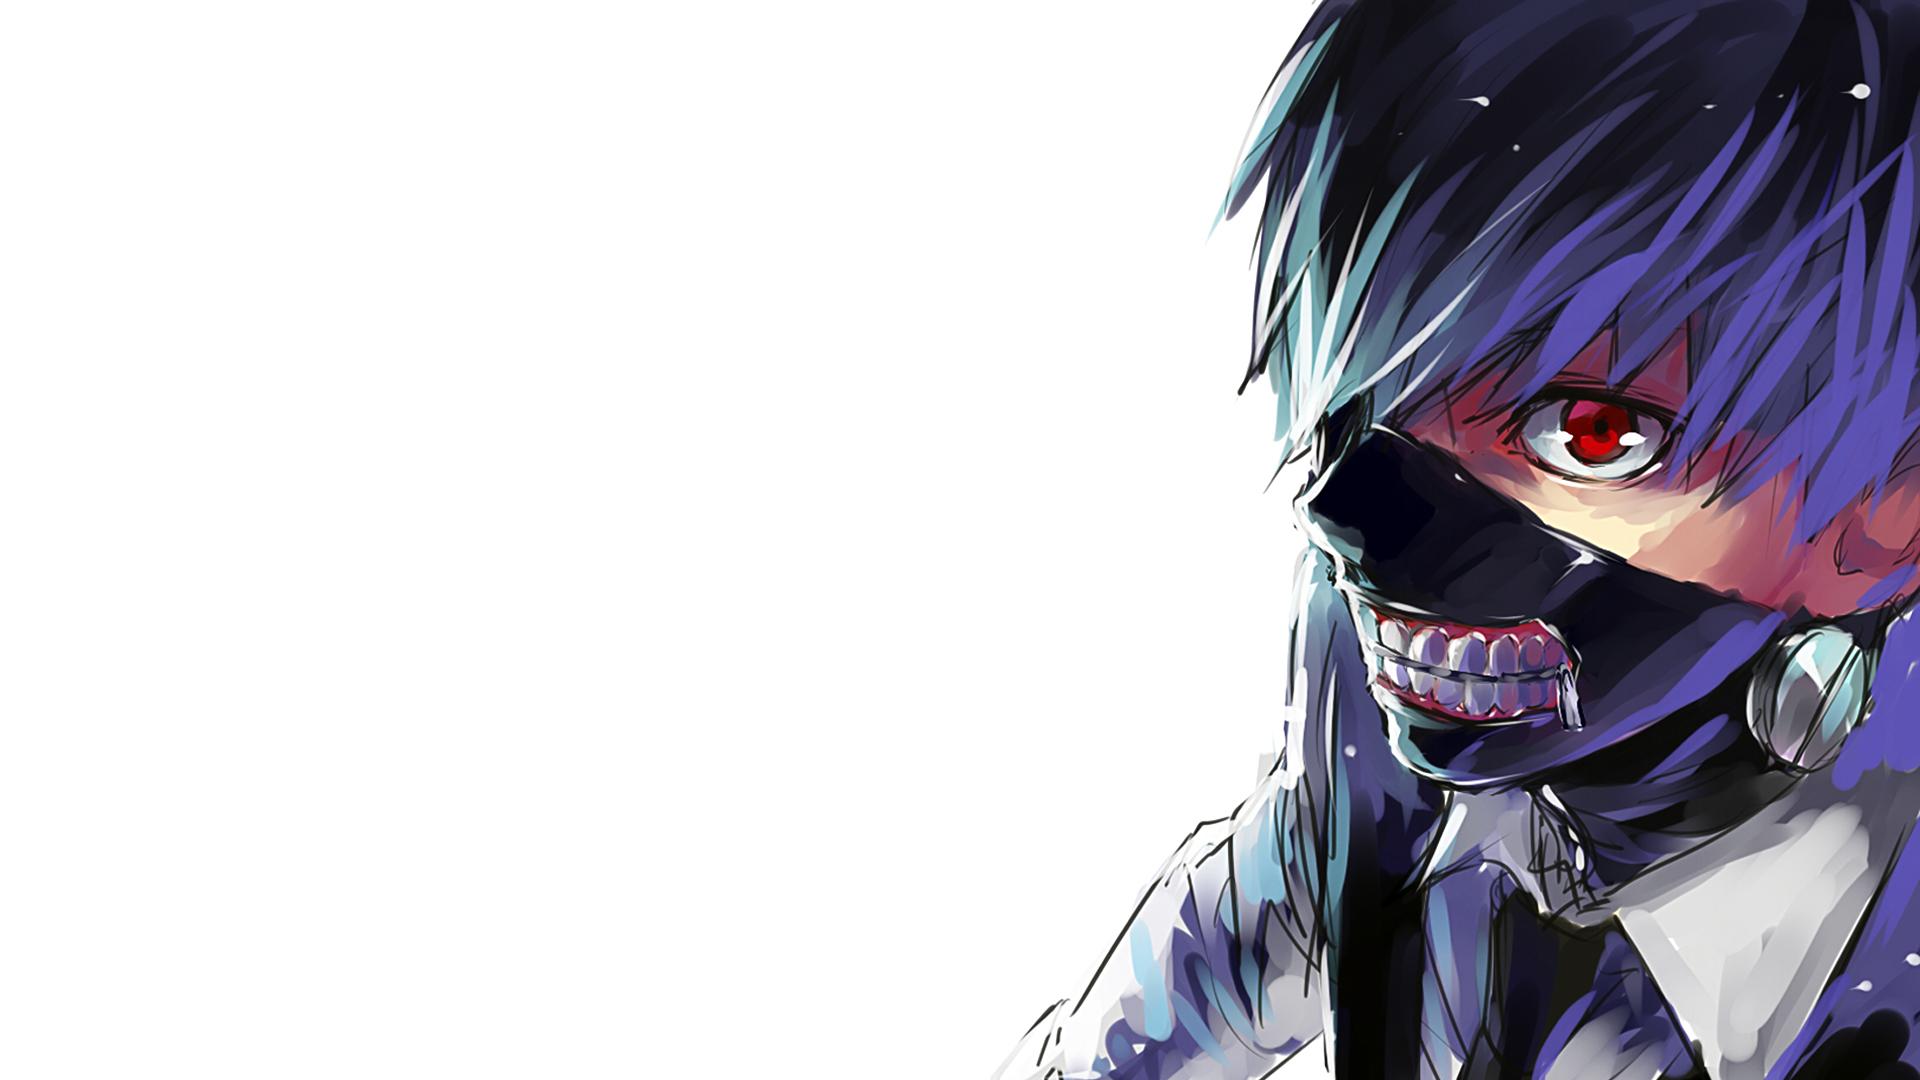 Mask Tokyo Ghoul Anime HD Wallpaper 1920x1080